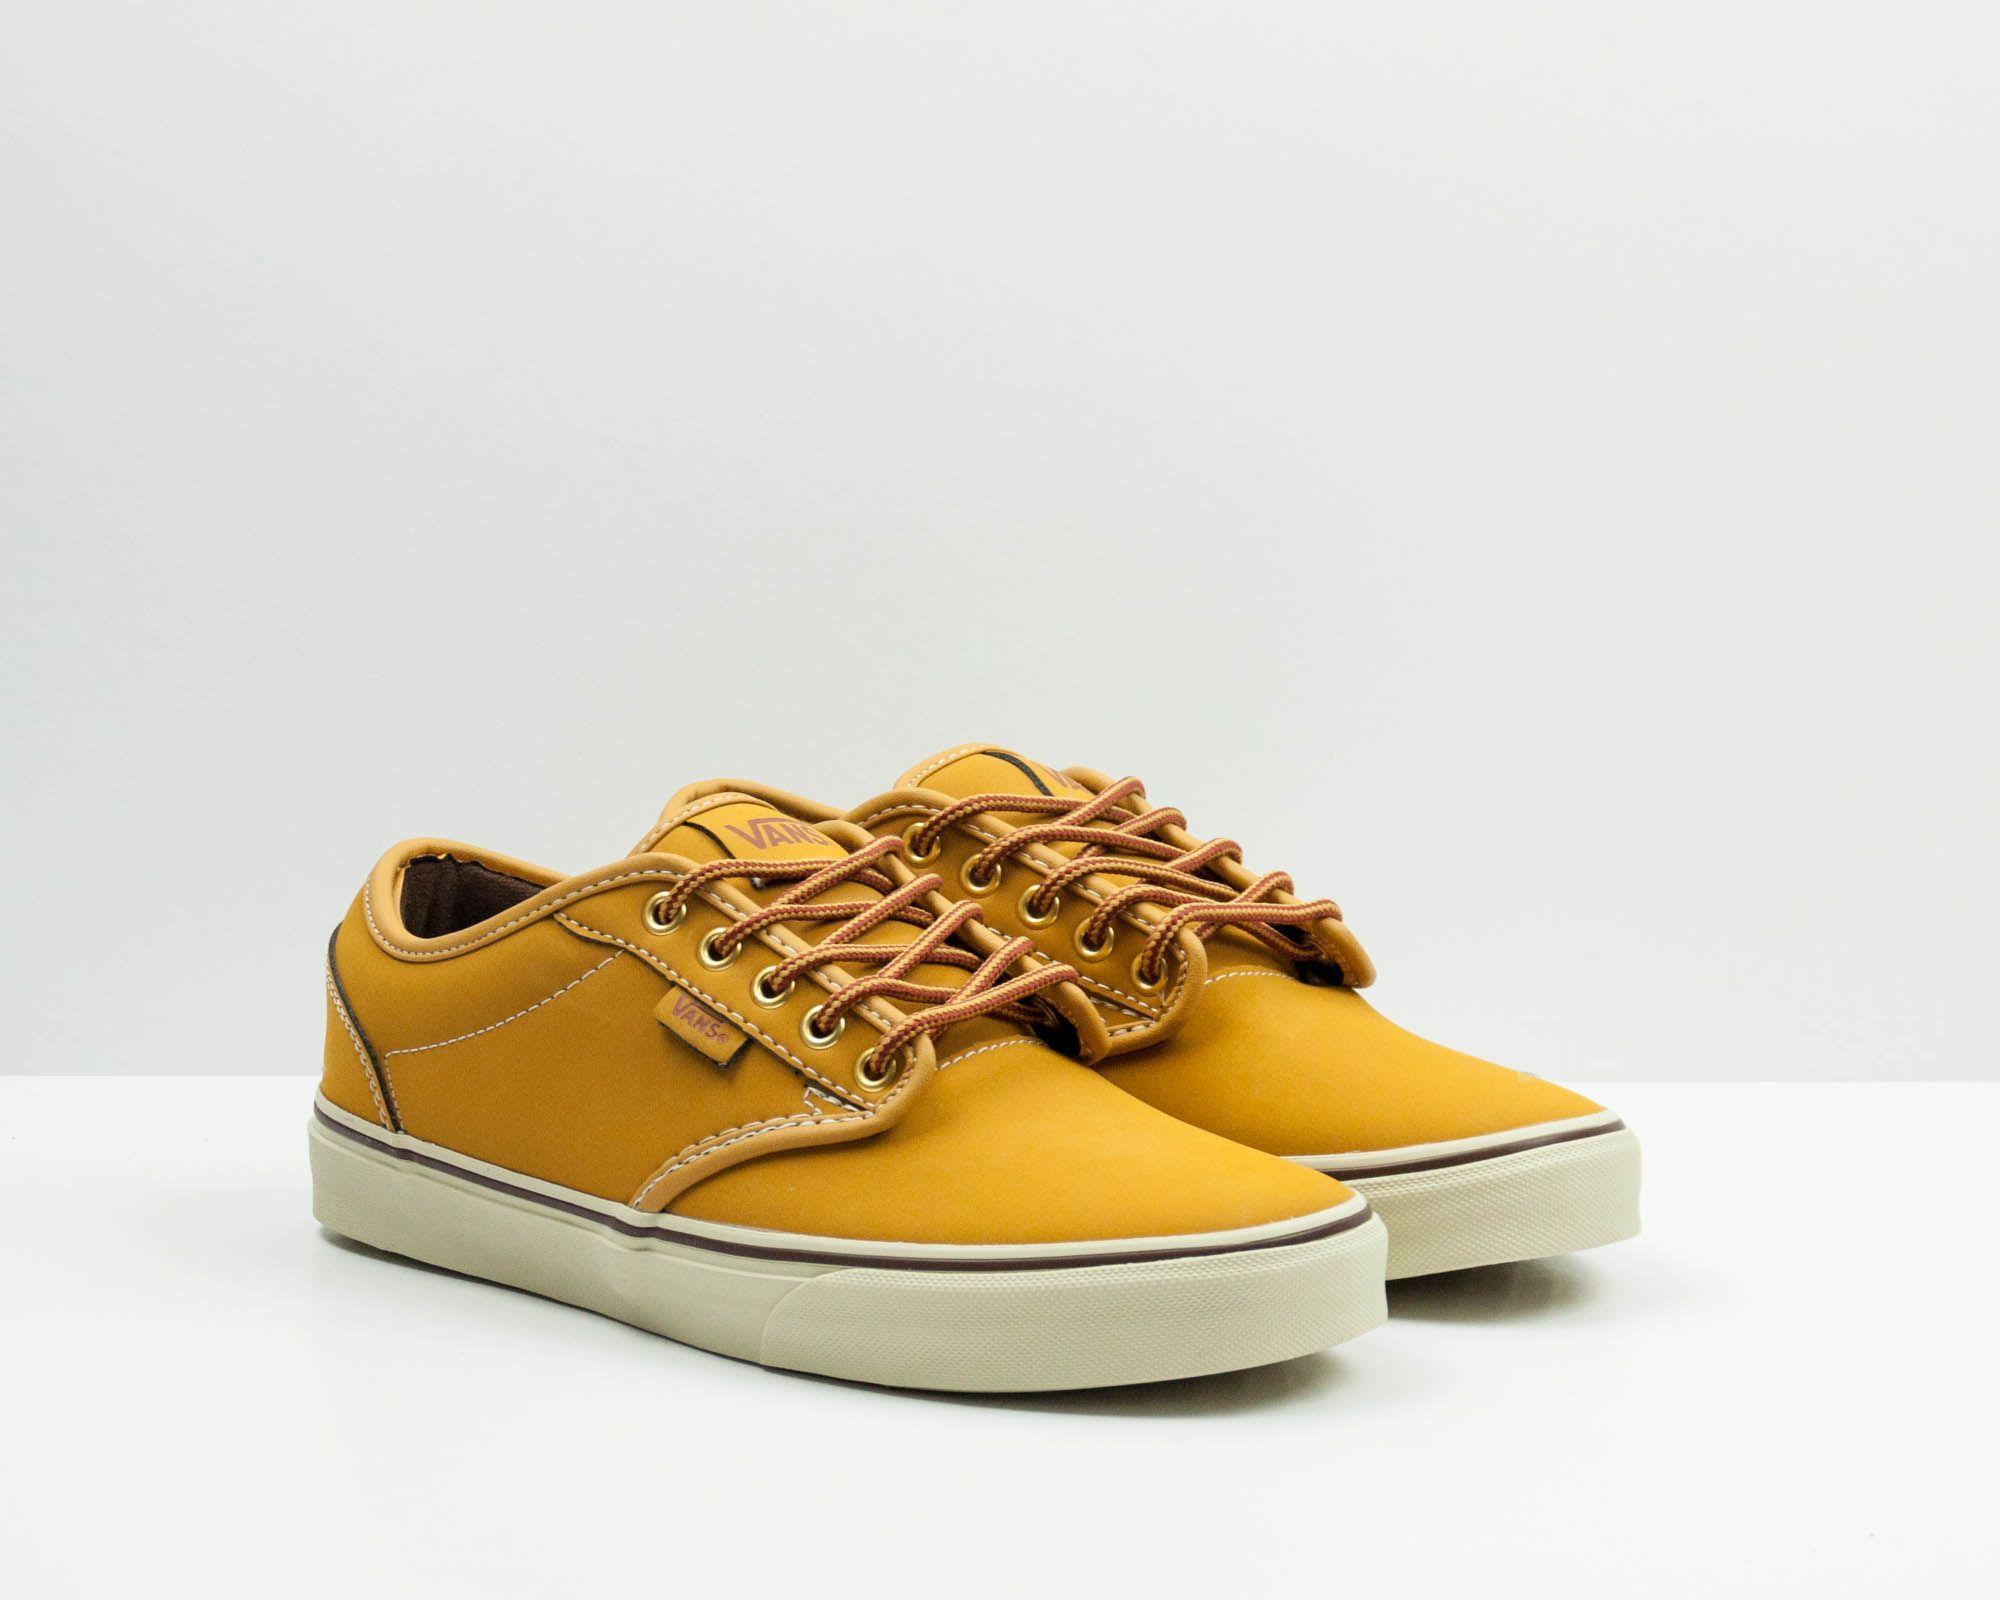 vans amarillas old skool hombre